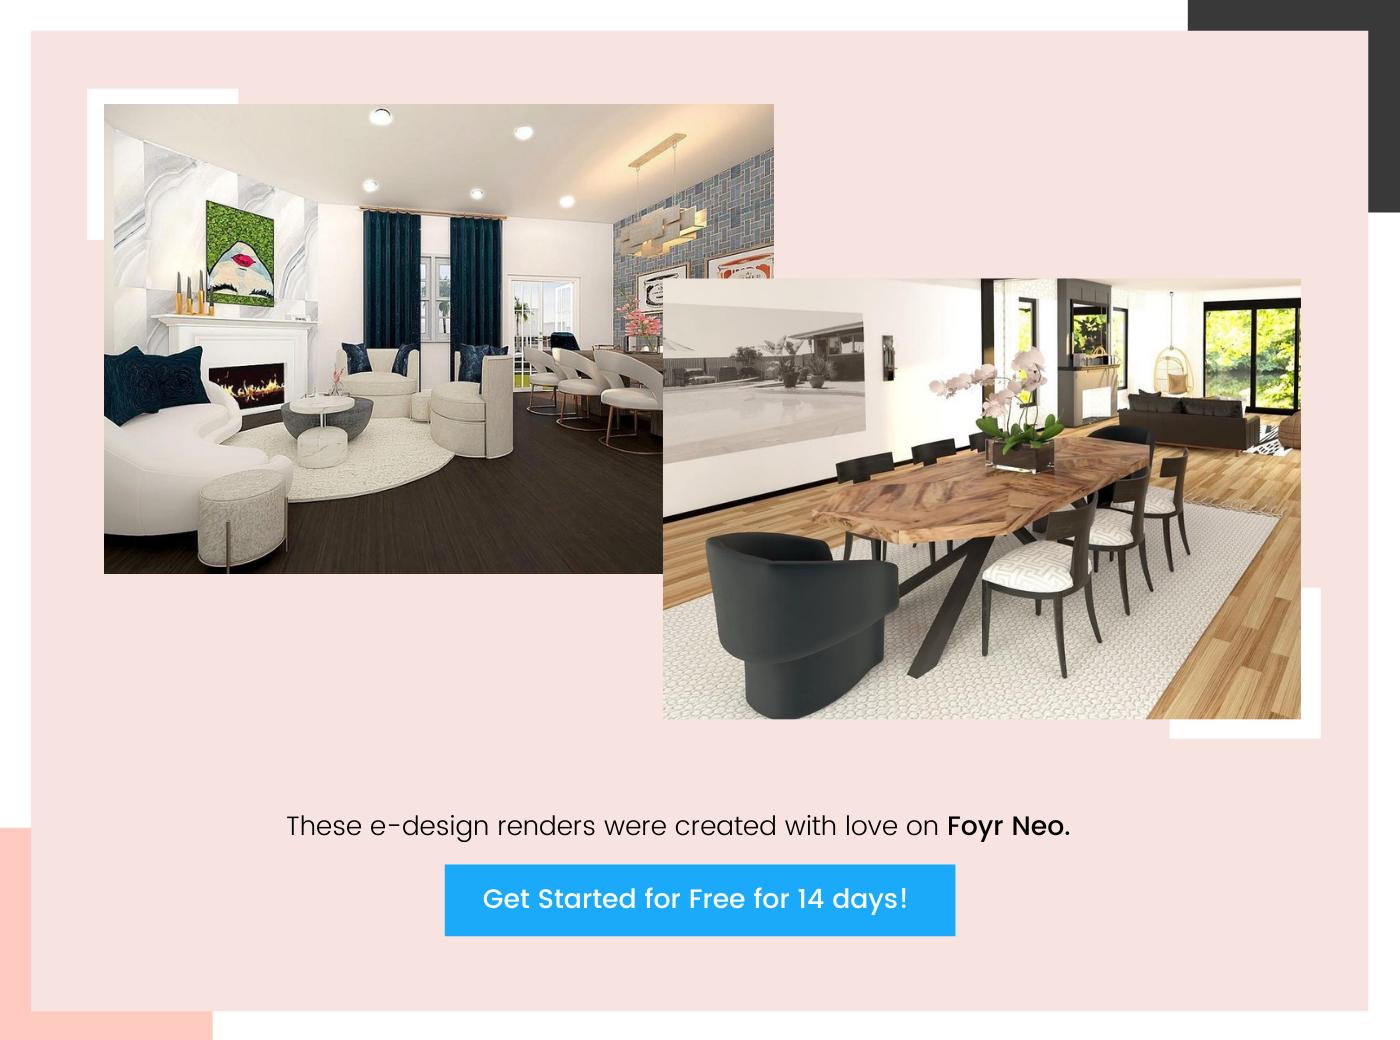 foyr e-design renders 2